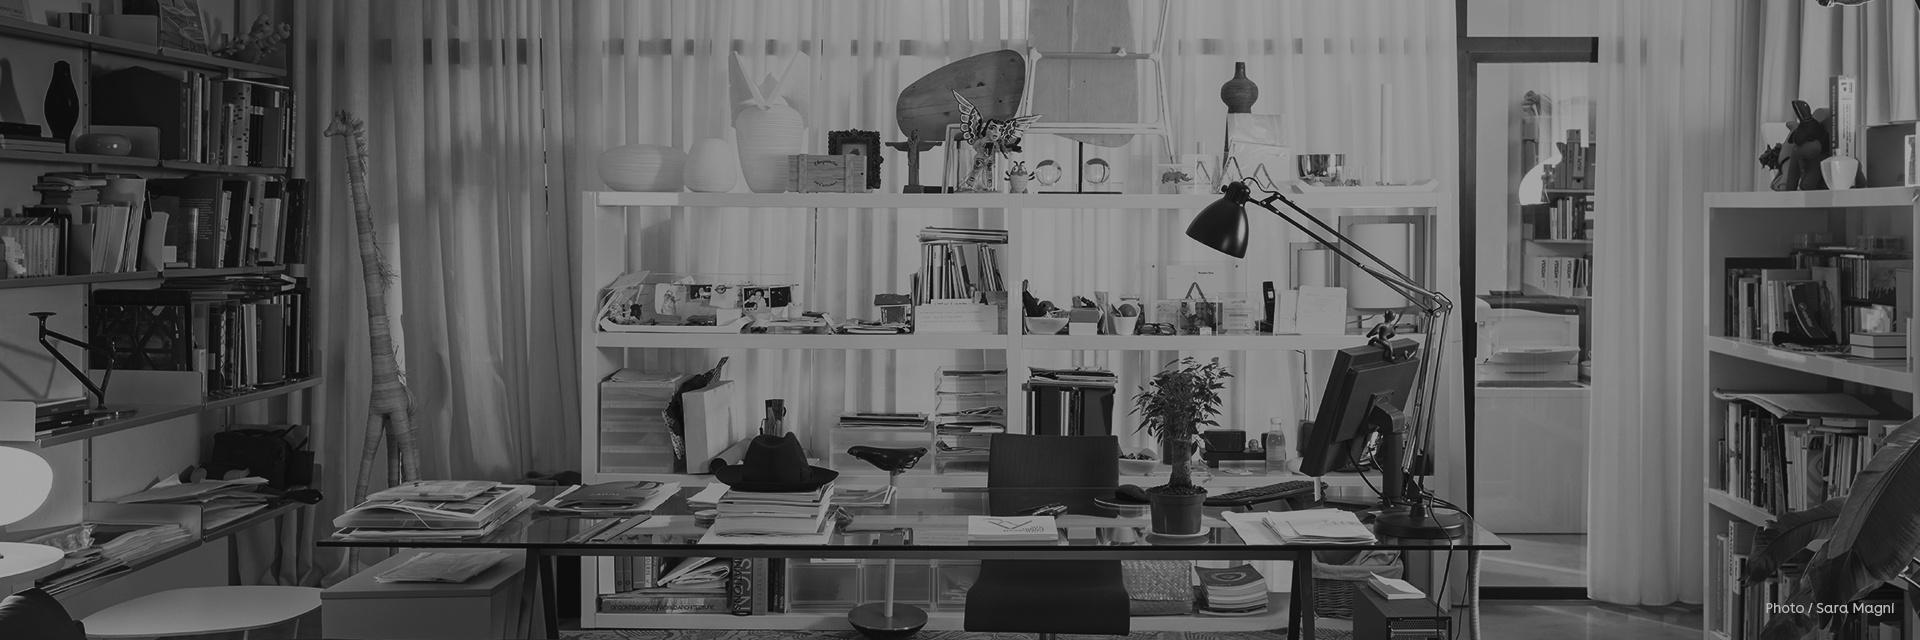 Palomba Serafini Associati (ps+a)是设计界的模范CP,一同于米兰成立了设计工作室。早在1994年,刚刚从罗马大学建筑系毕业的Roberto Palomba和Ludovica Serafini在交出了自己的第一个设计项目时,就出人意料的一举拿下了意大利国内最为重要的奖项Compasso d'oro。这些年来,他们拿下了包括WallpaperDesign Award、Good DesignAward、iF ProductDesign Award等一系列设计界重量级奖项,逐步奠定了他们在欧洲设计界的声誉。